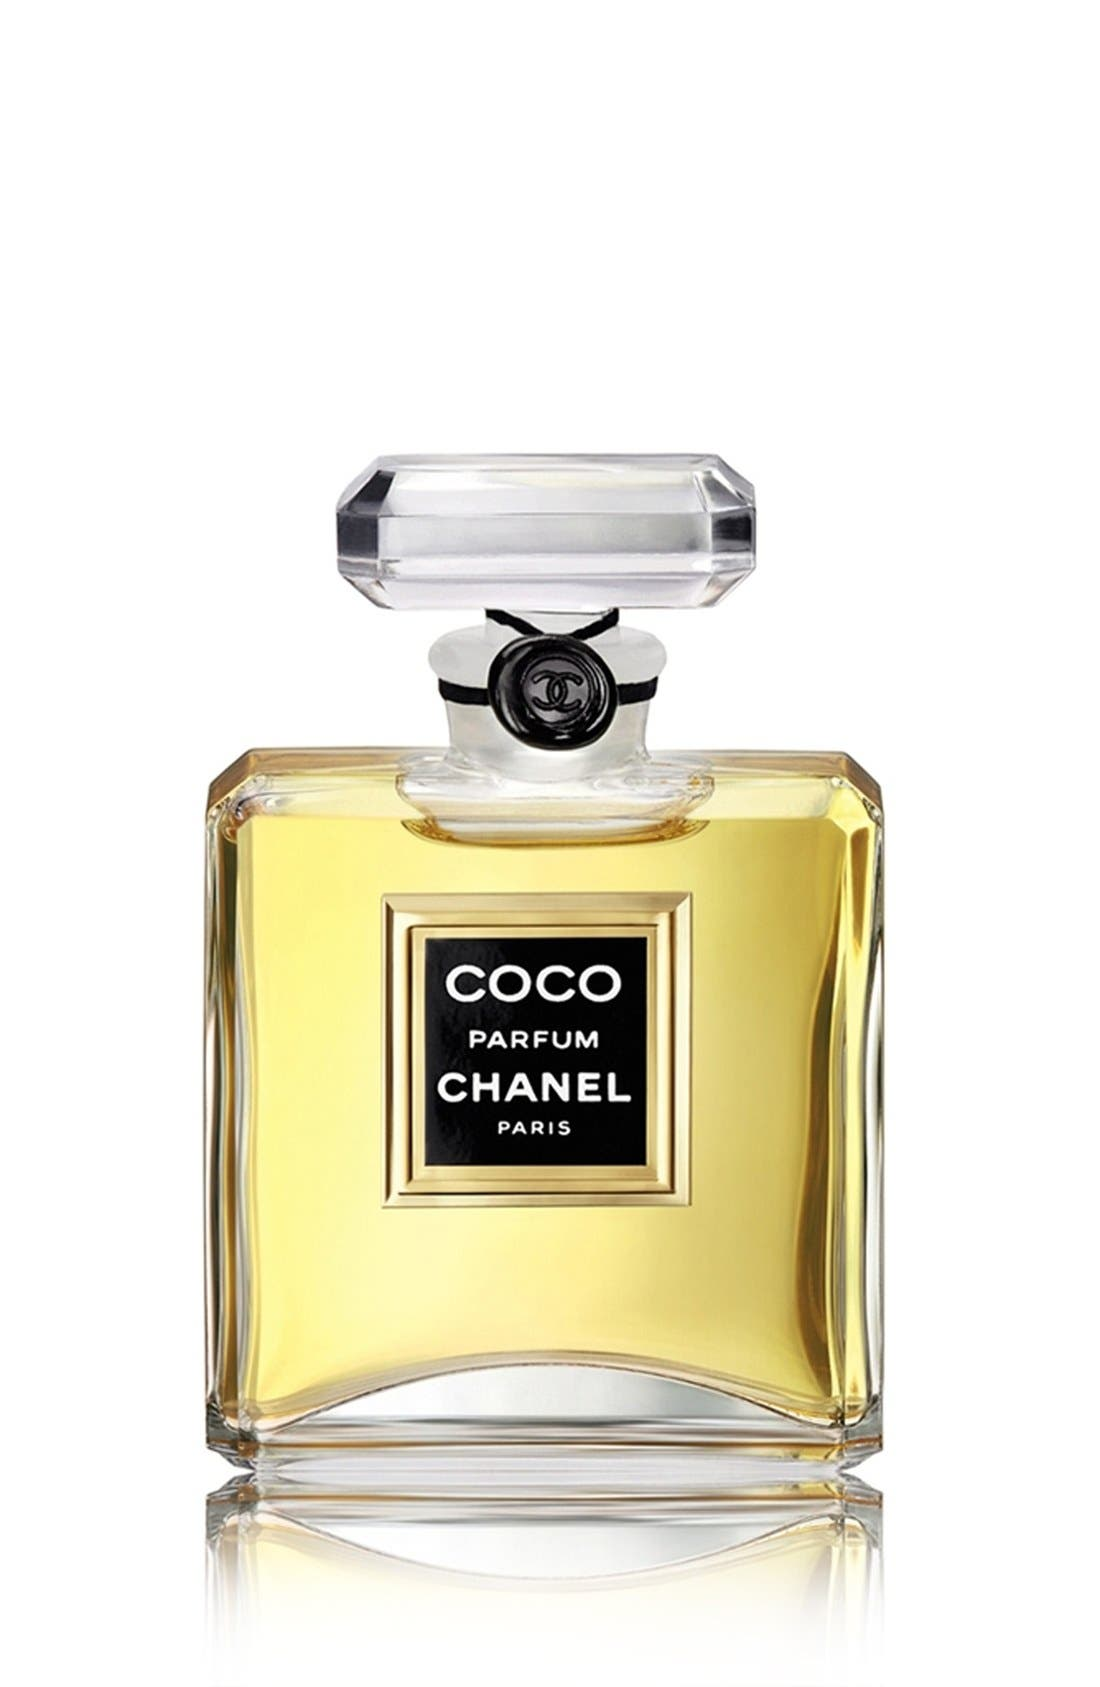 CHANEL COCO  Parfum Bottle